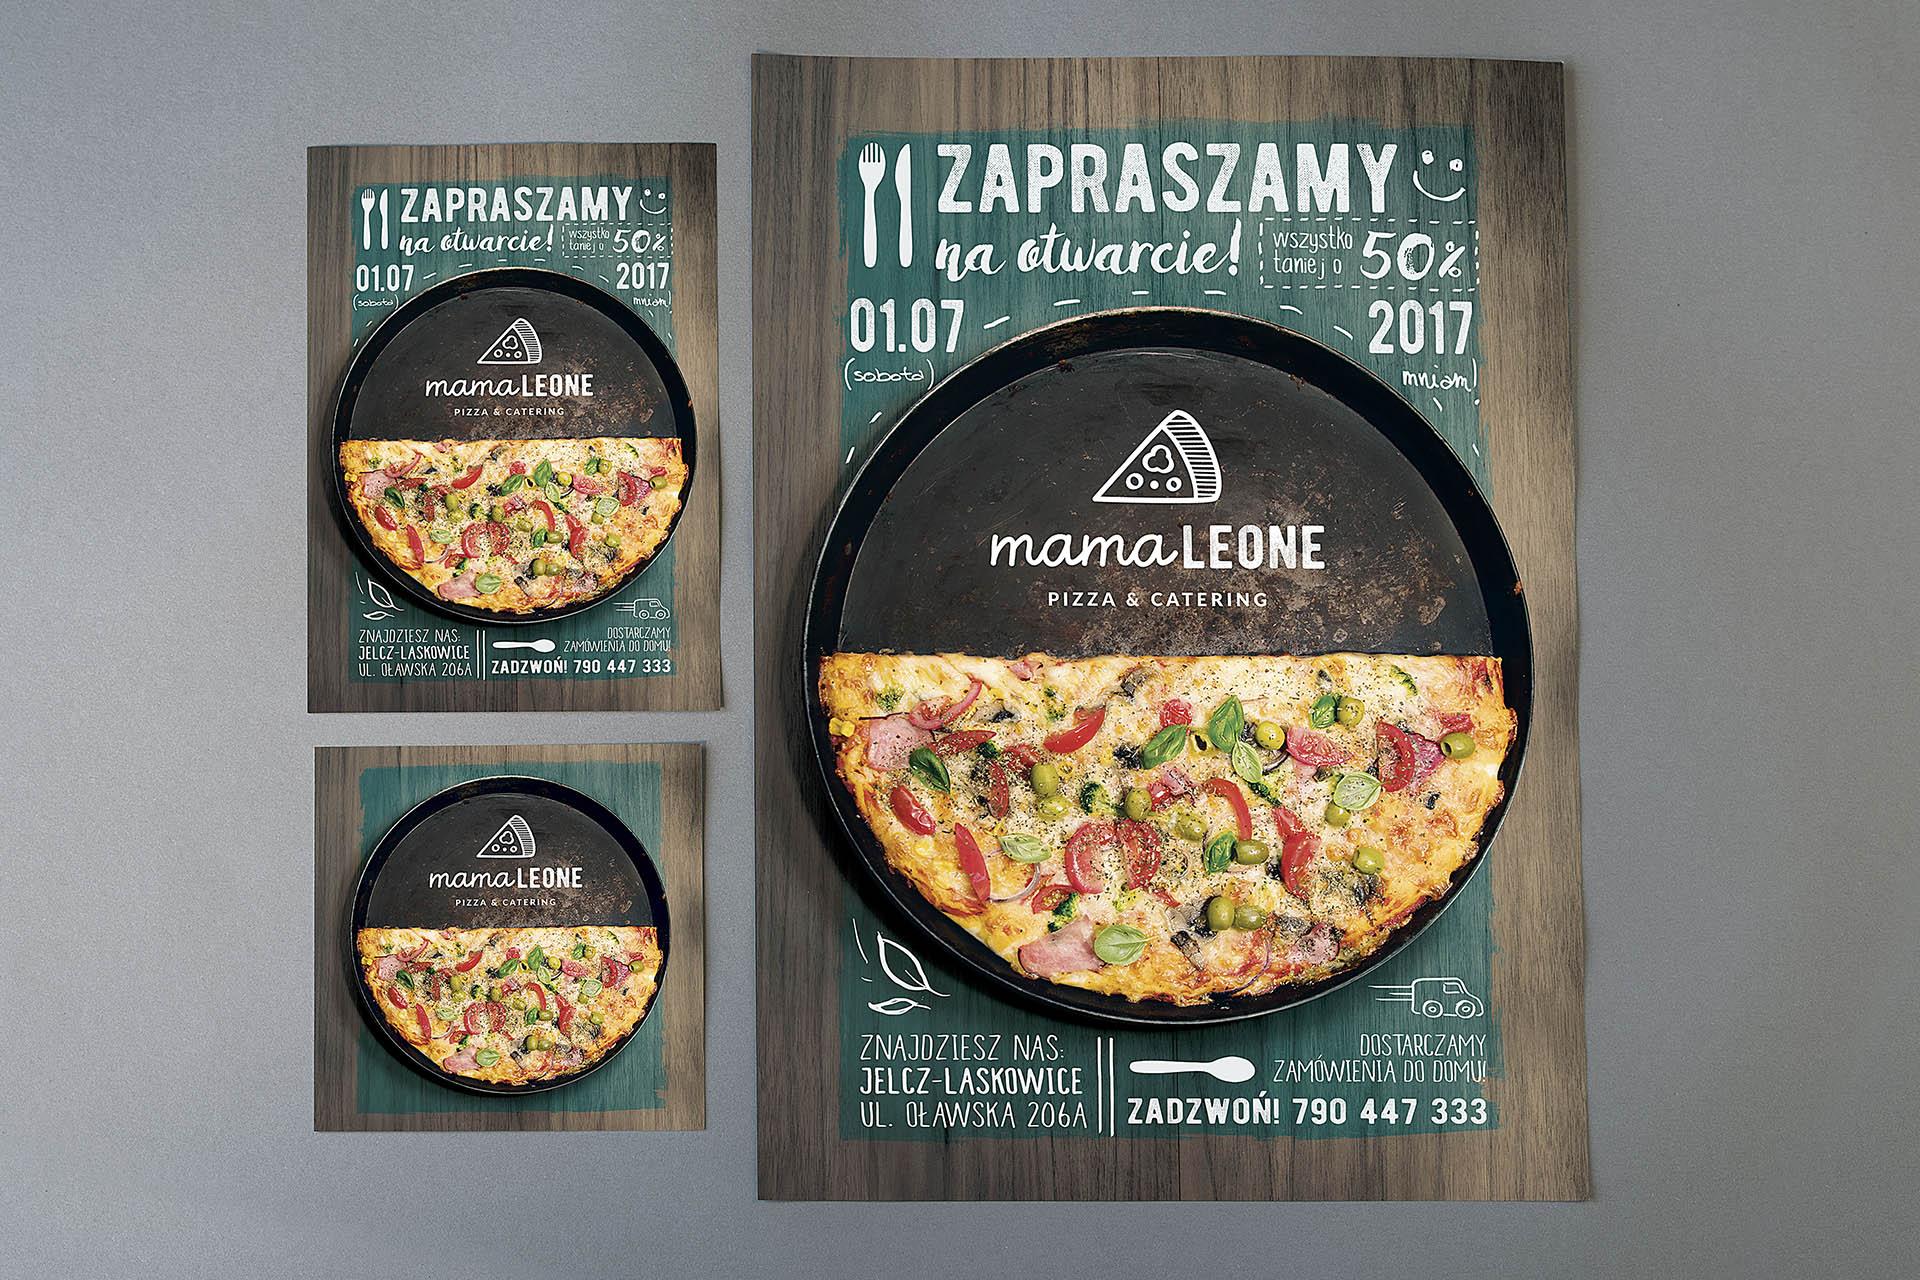 Pizzeria Mamaleone plakaty